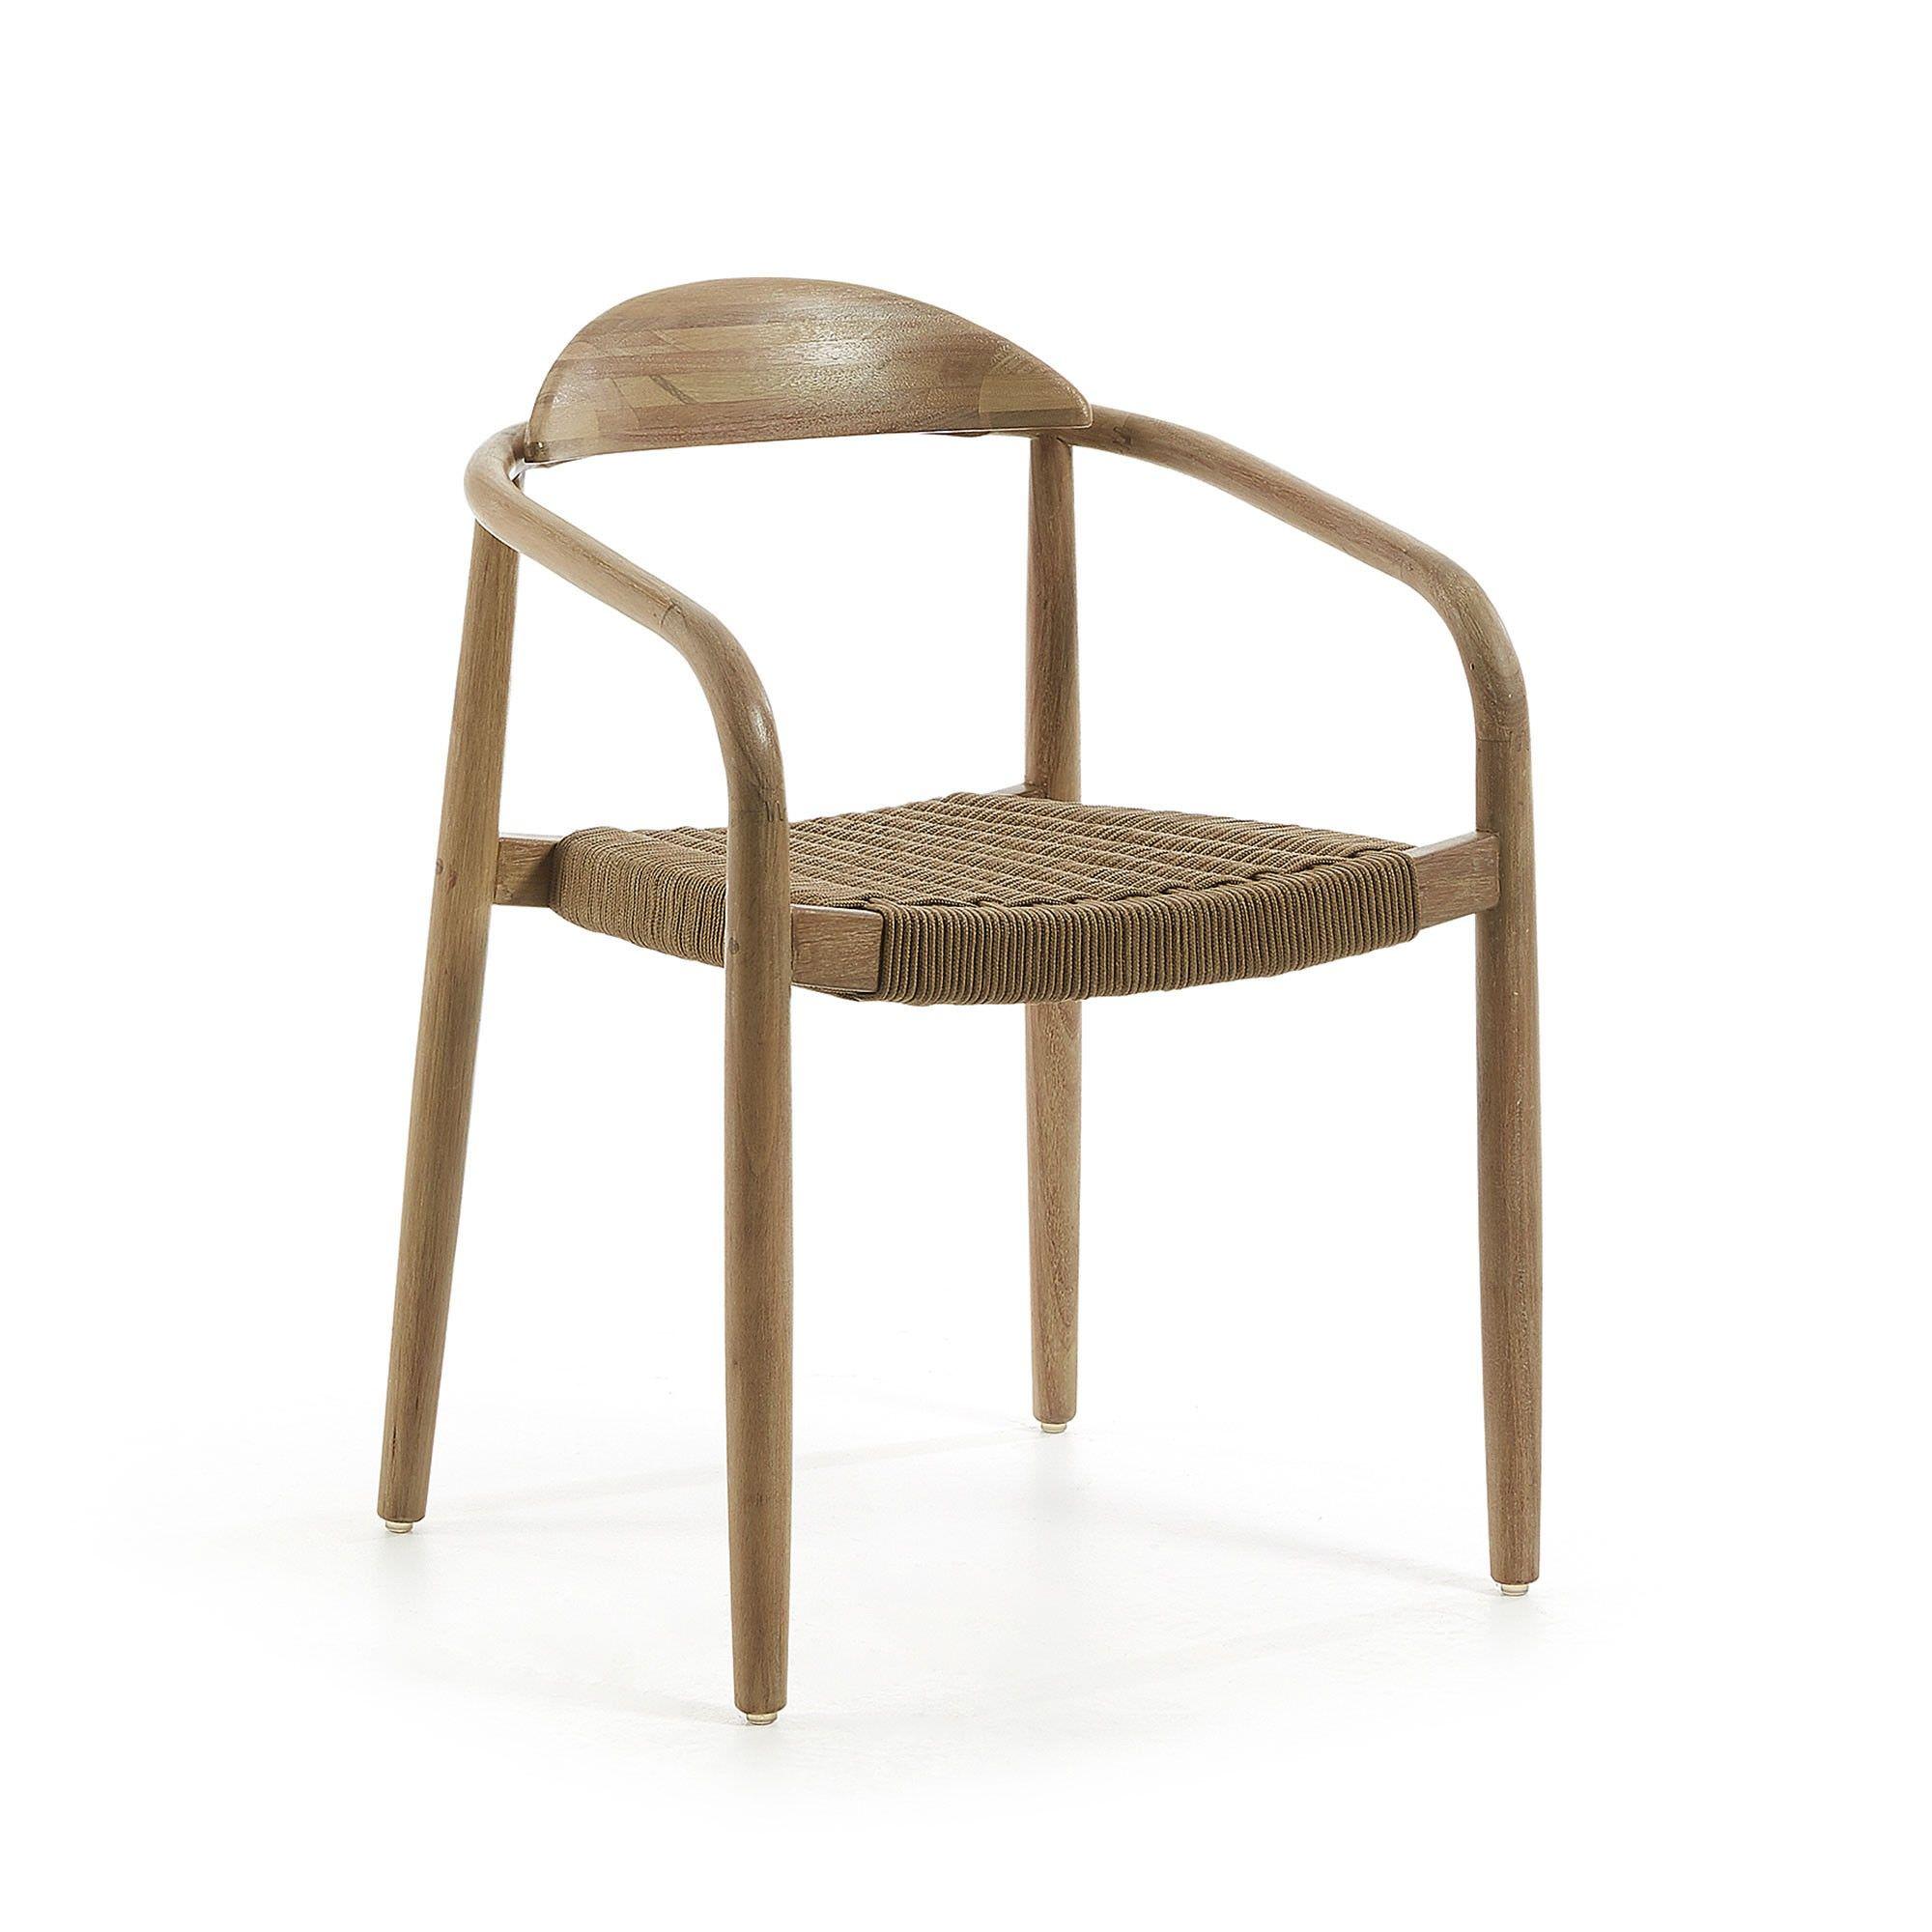 Galton Eucalyptus Timber Indoor / Outdoor Dining Armchair with Rope Seat, Natural / Brown